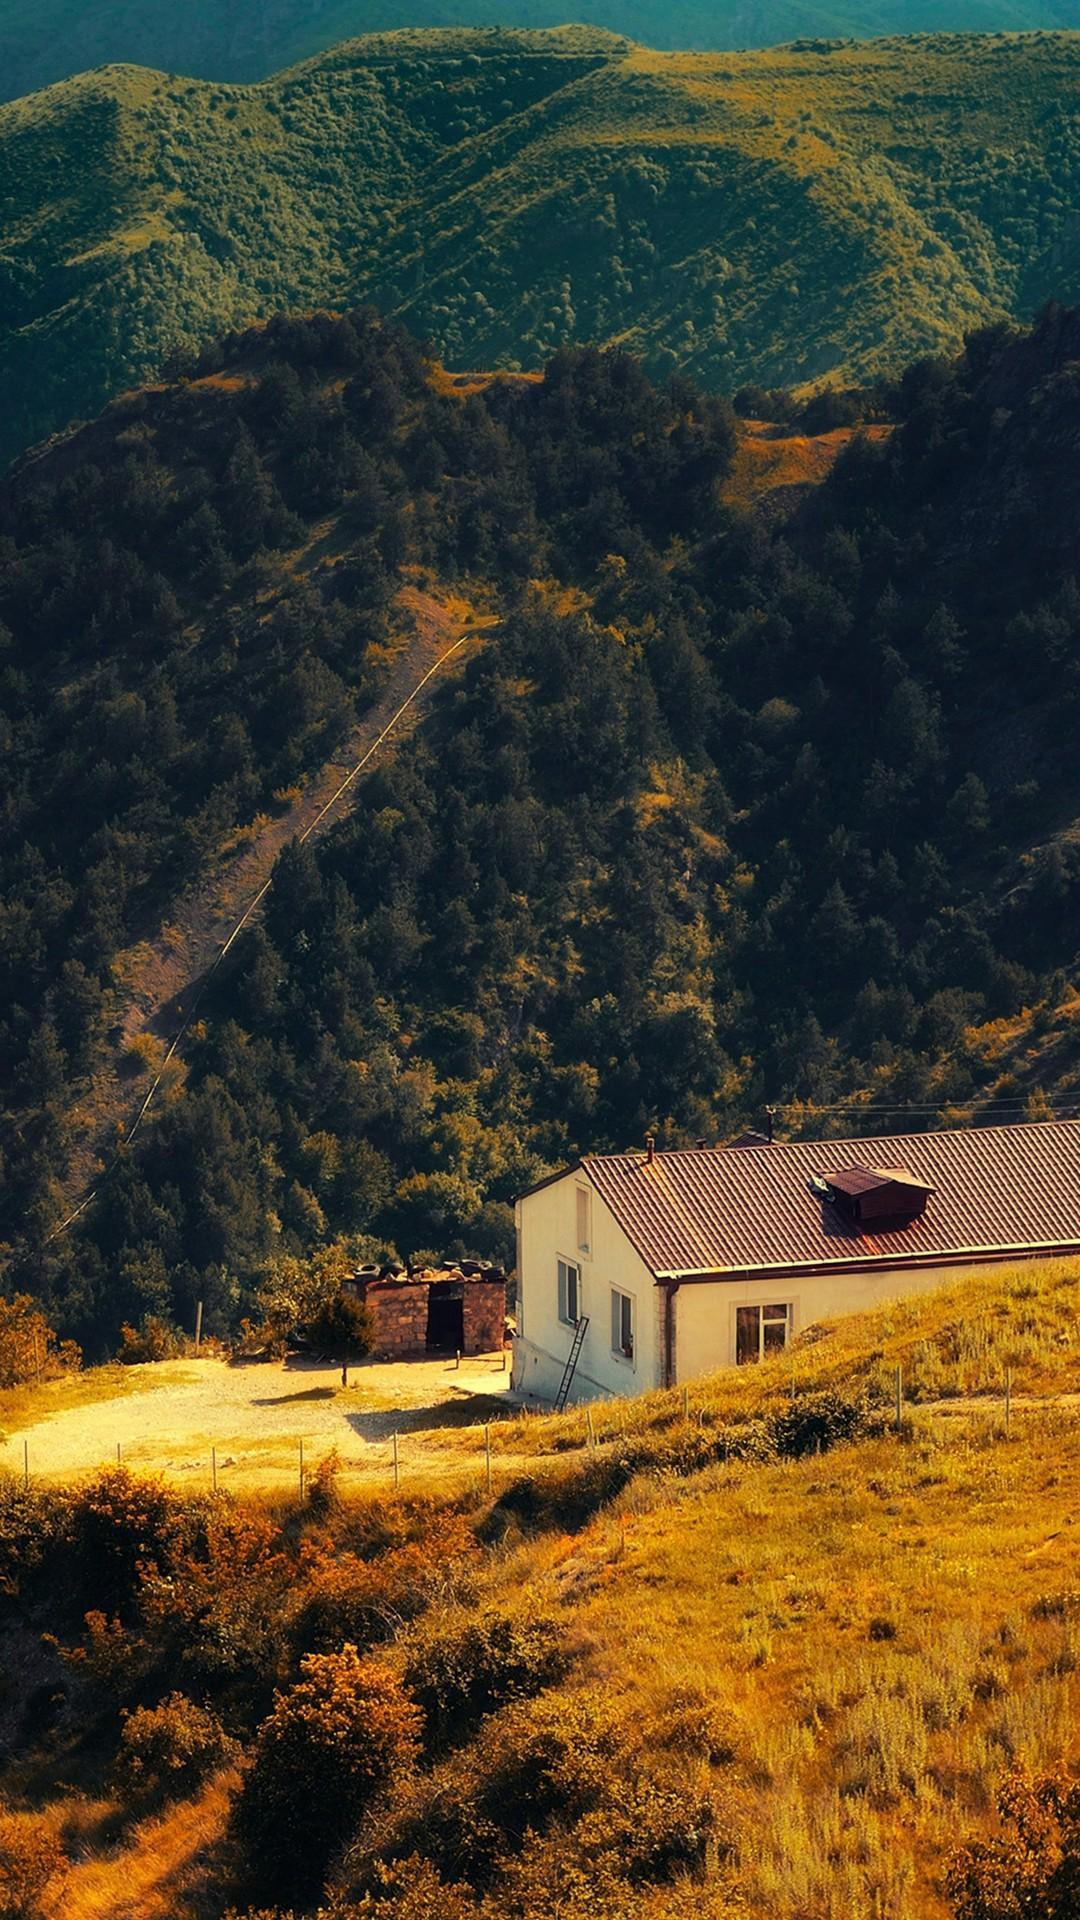 Karabakh Armenia Nature With Mountain House Fall iPhone 6 wallpaper